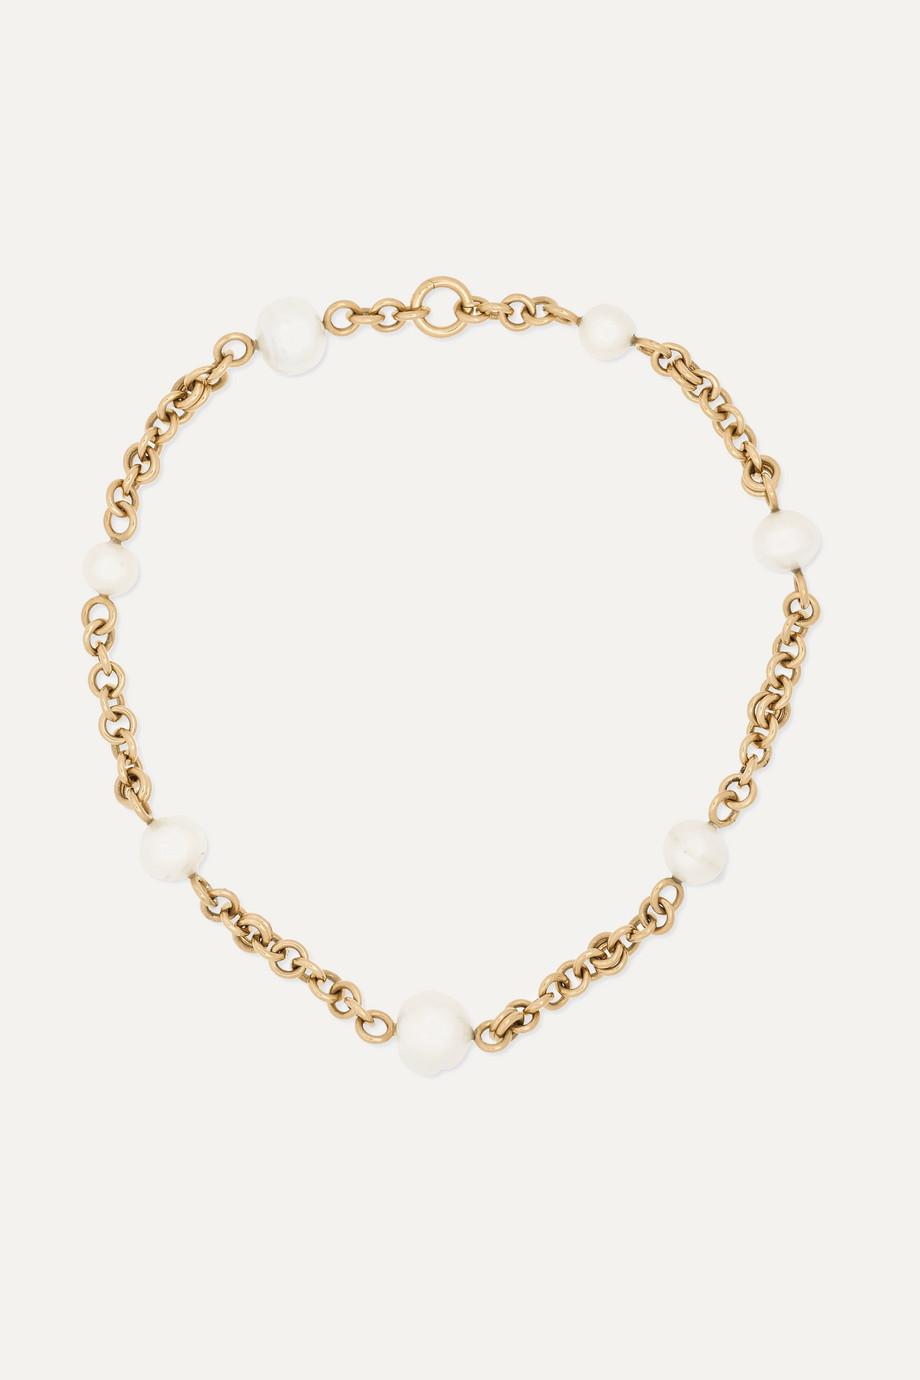 Spinelli Kilcollin Varuna 18-karat gold pearl necklace